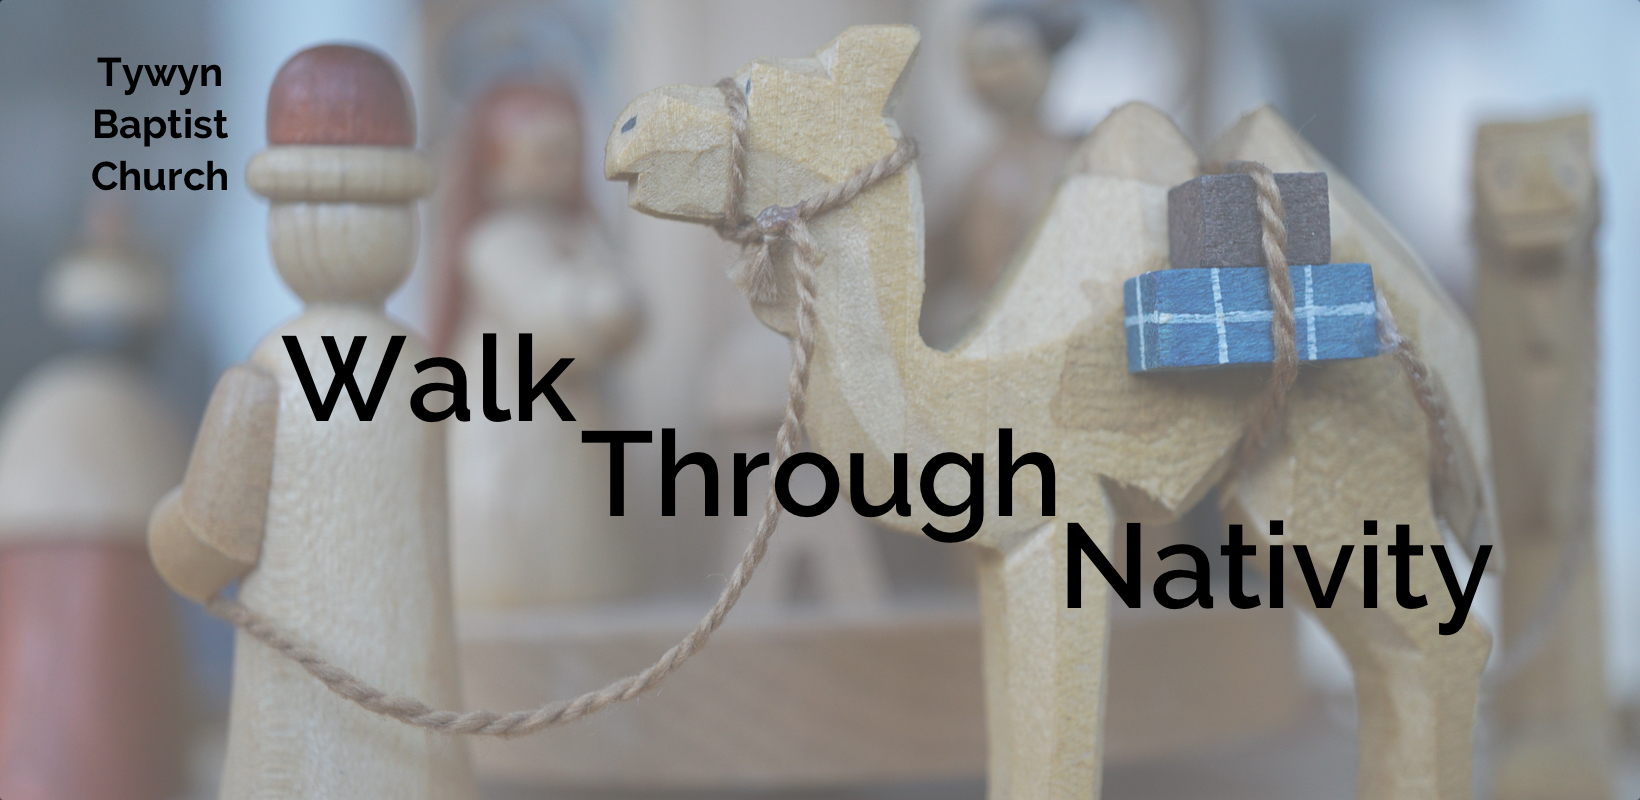 Walk through nativity